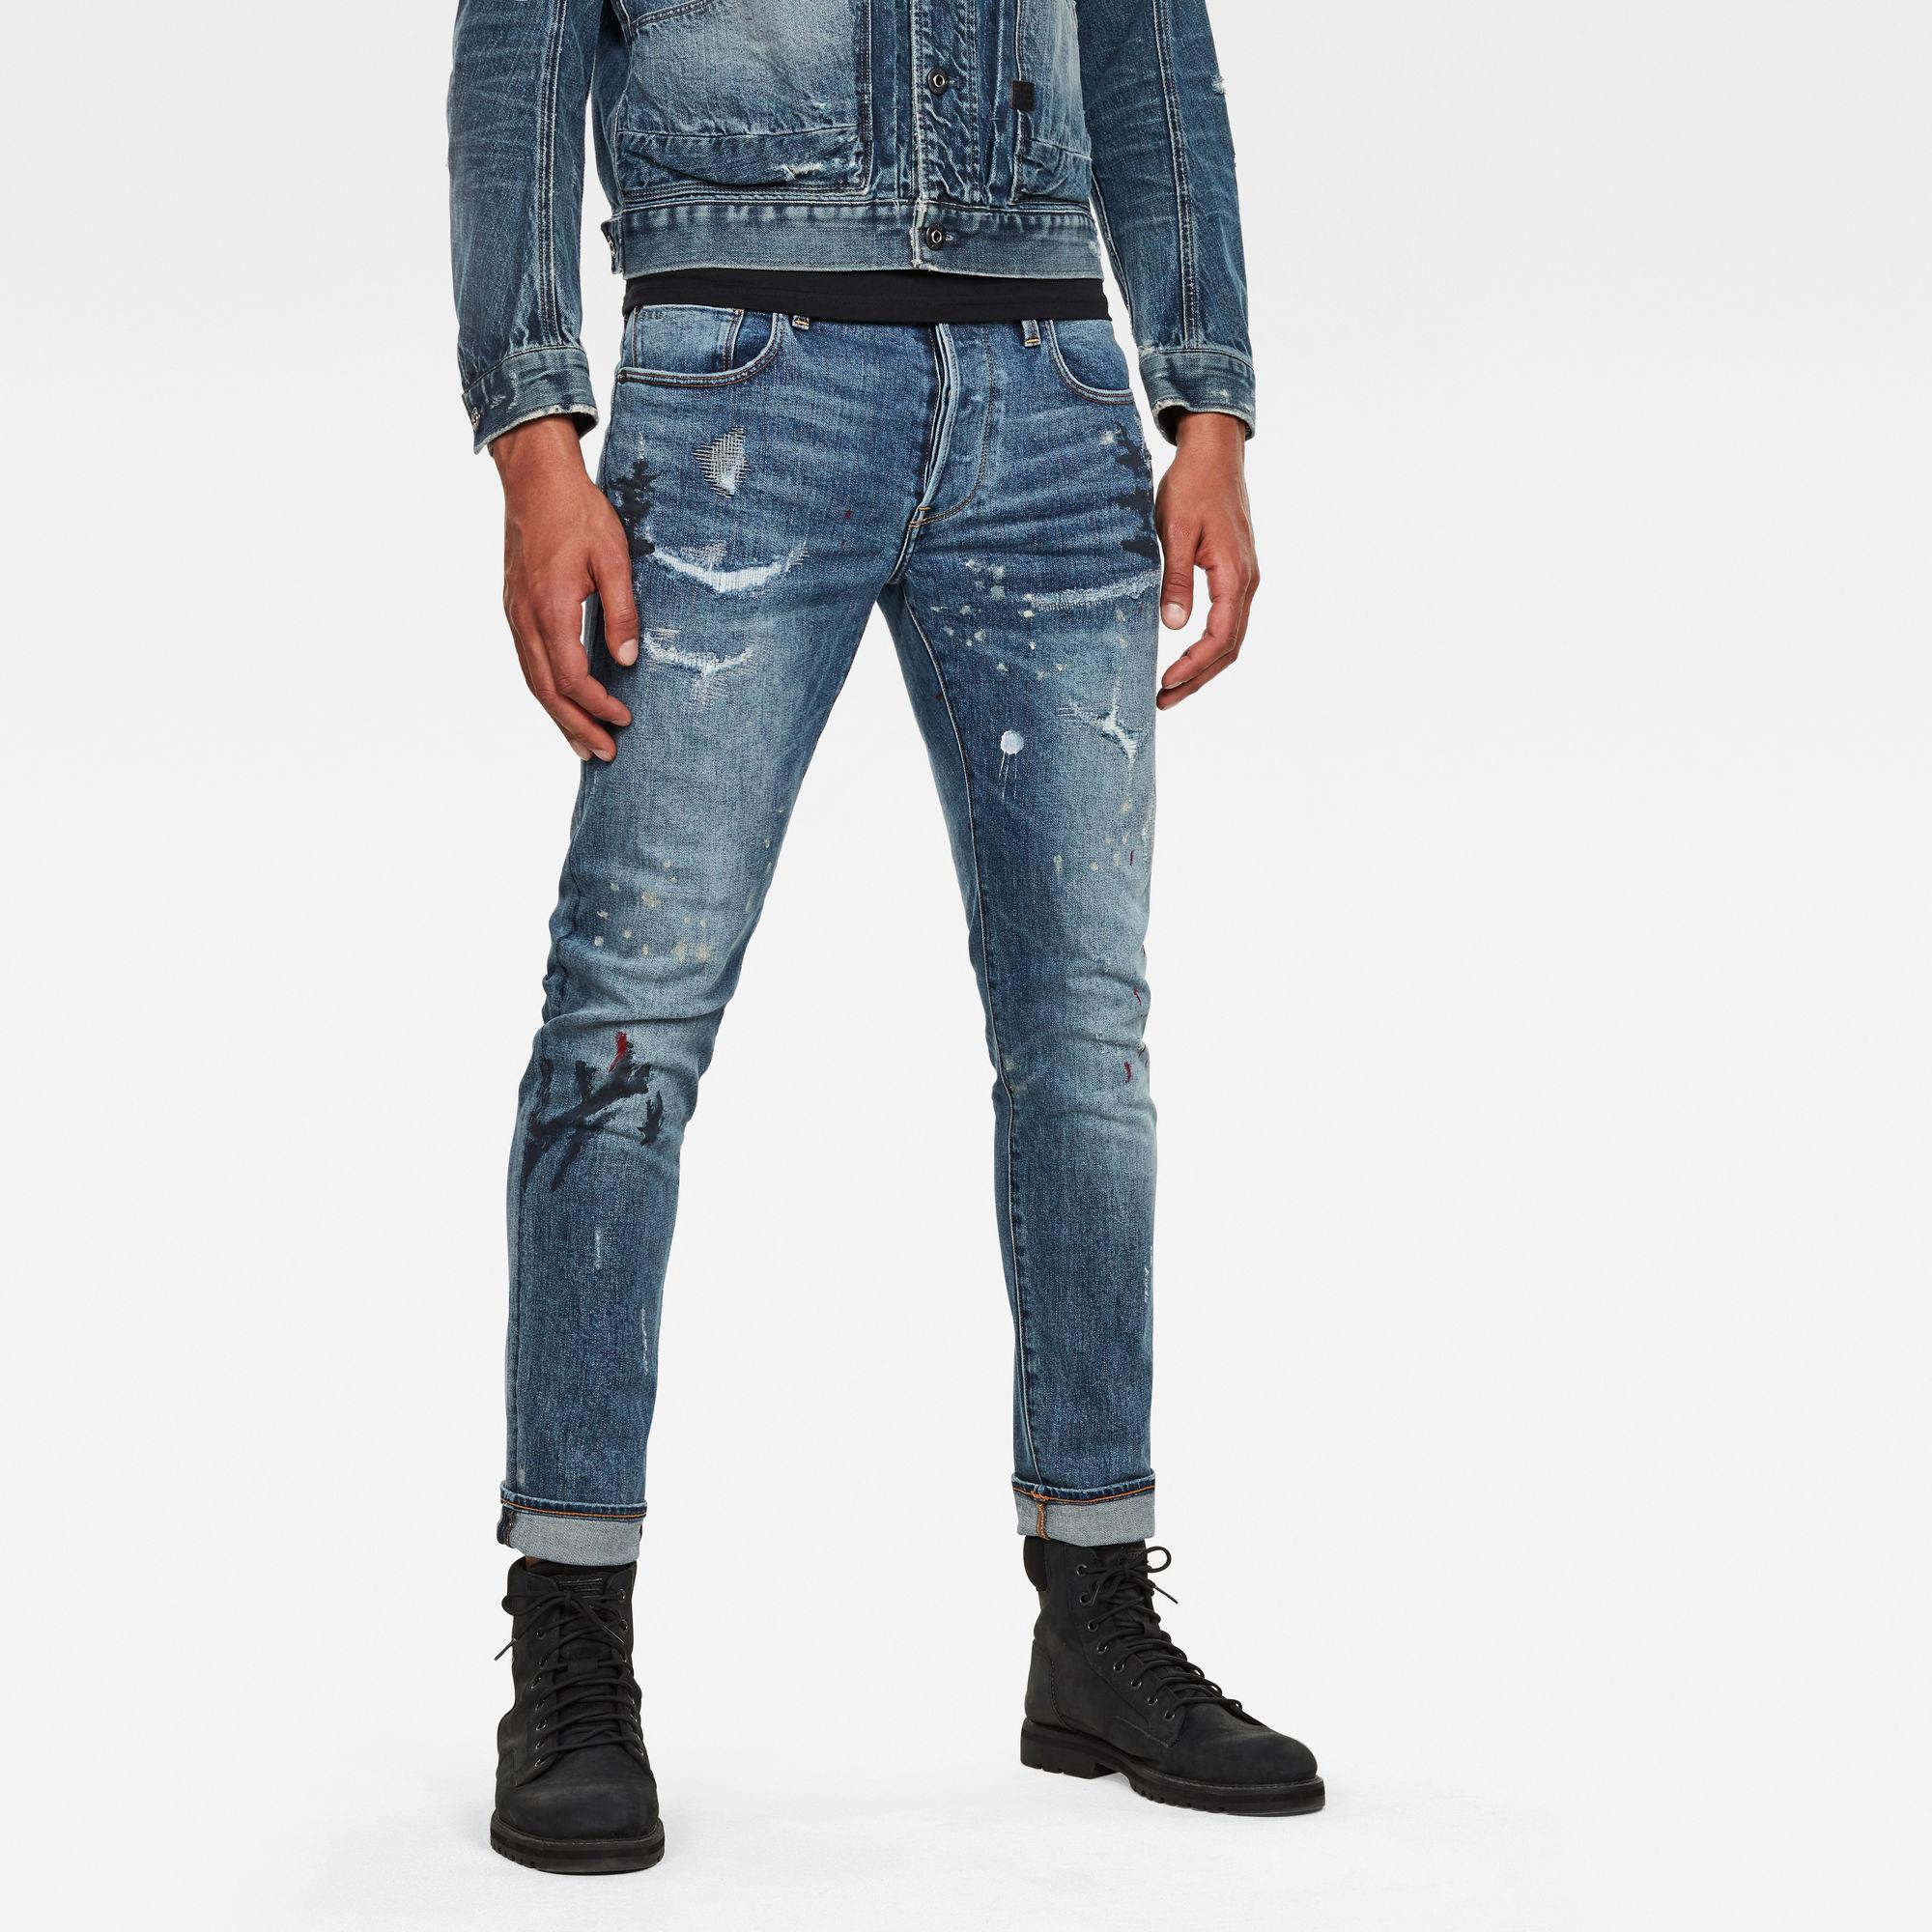 pantalón hombre g-star: Jeans 3301 Slim Azul claro 3